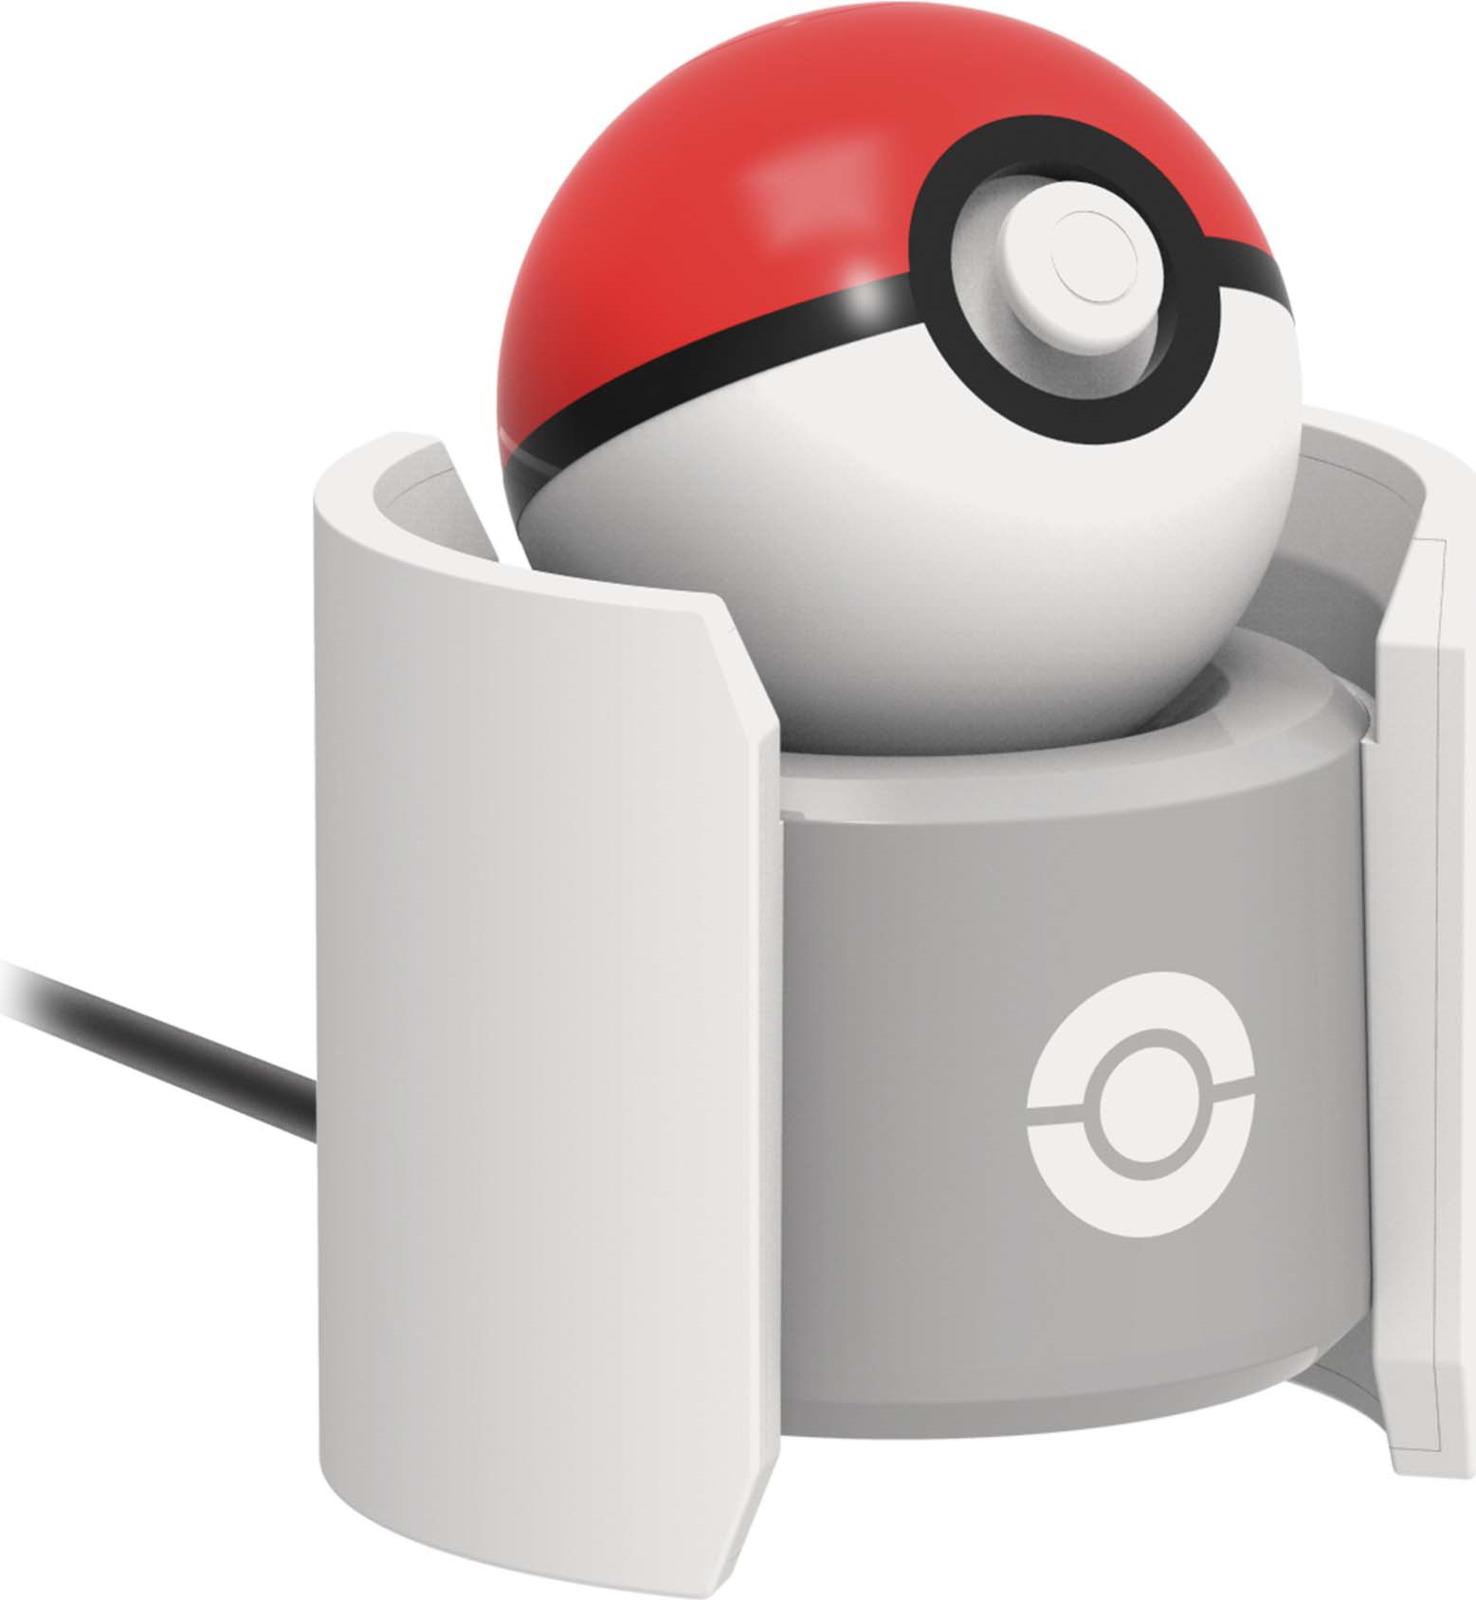 Стенд для зарядки Hori Poke Ball для консоли Nintendo Switch new nintendo 2ds xl poke ball edition red white портативная игровая приставка